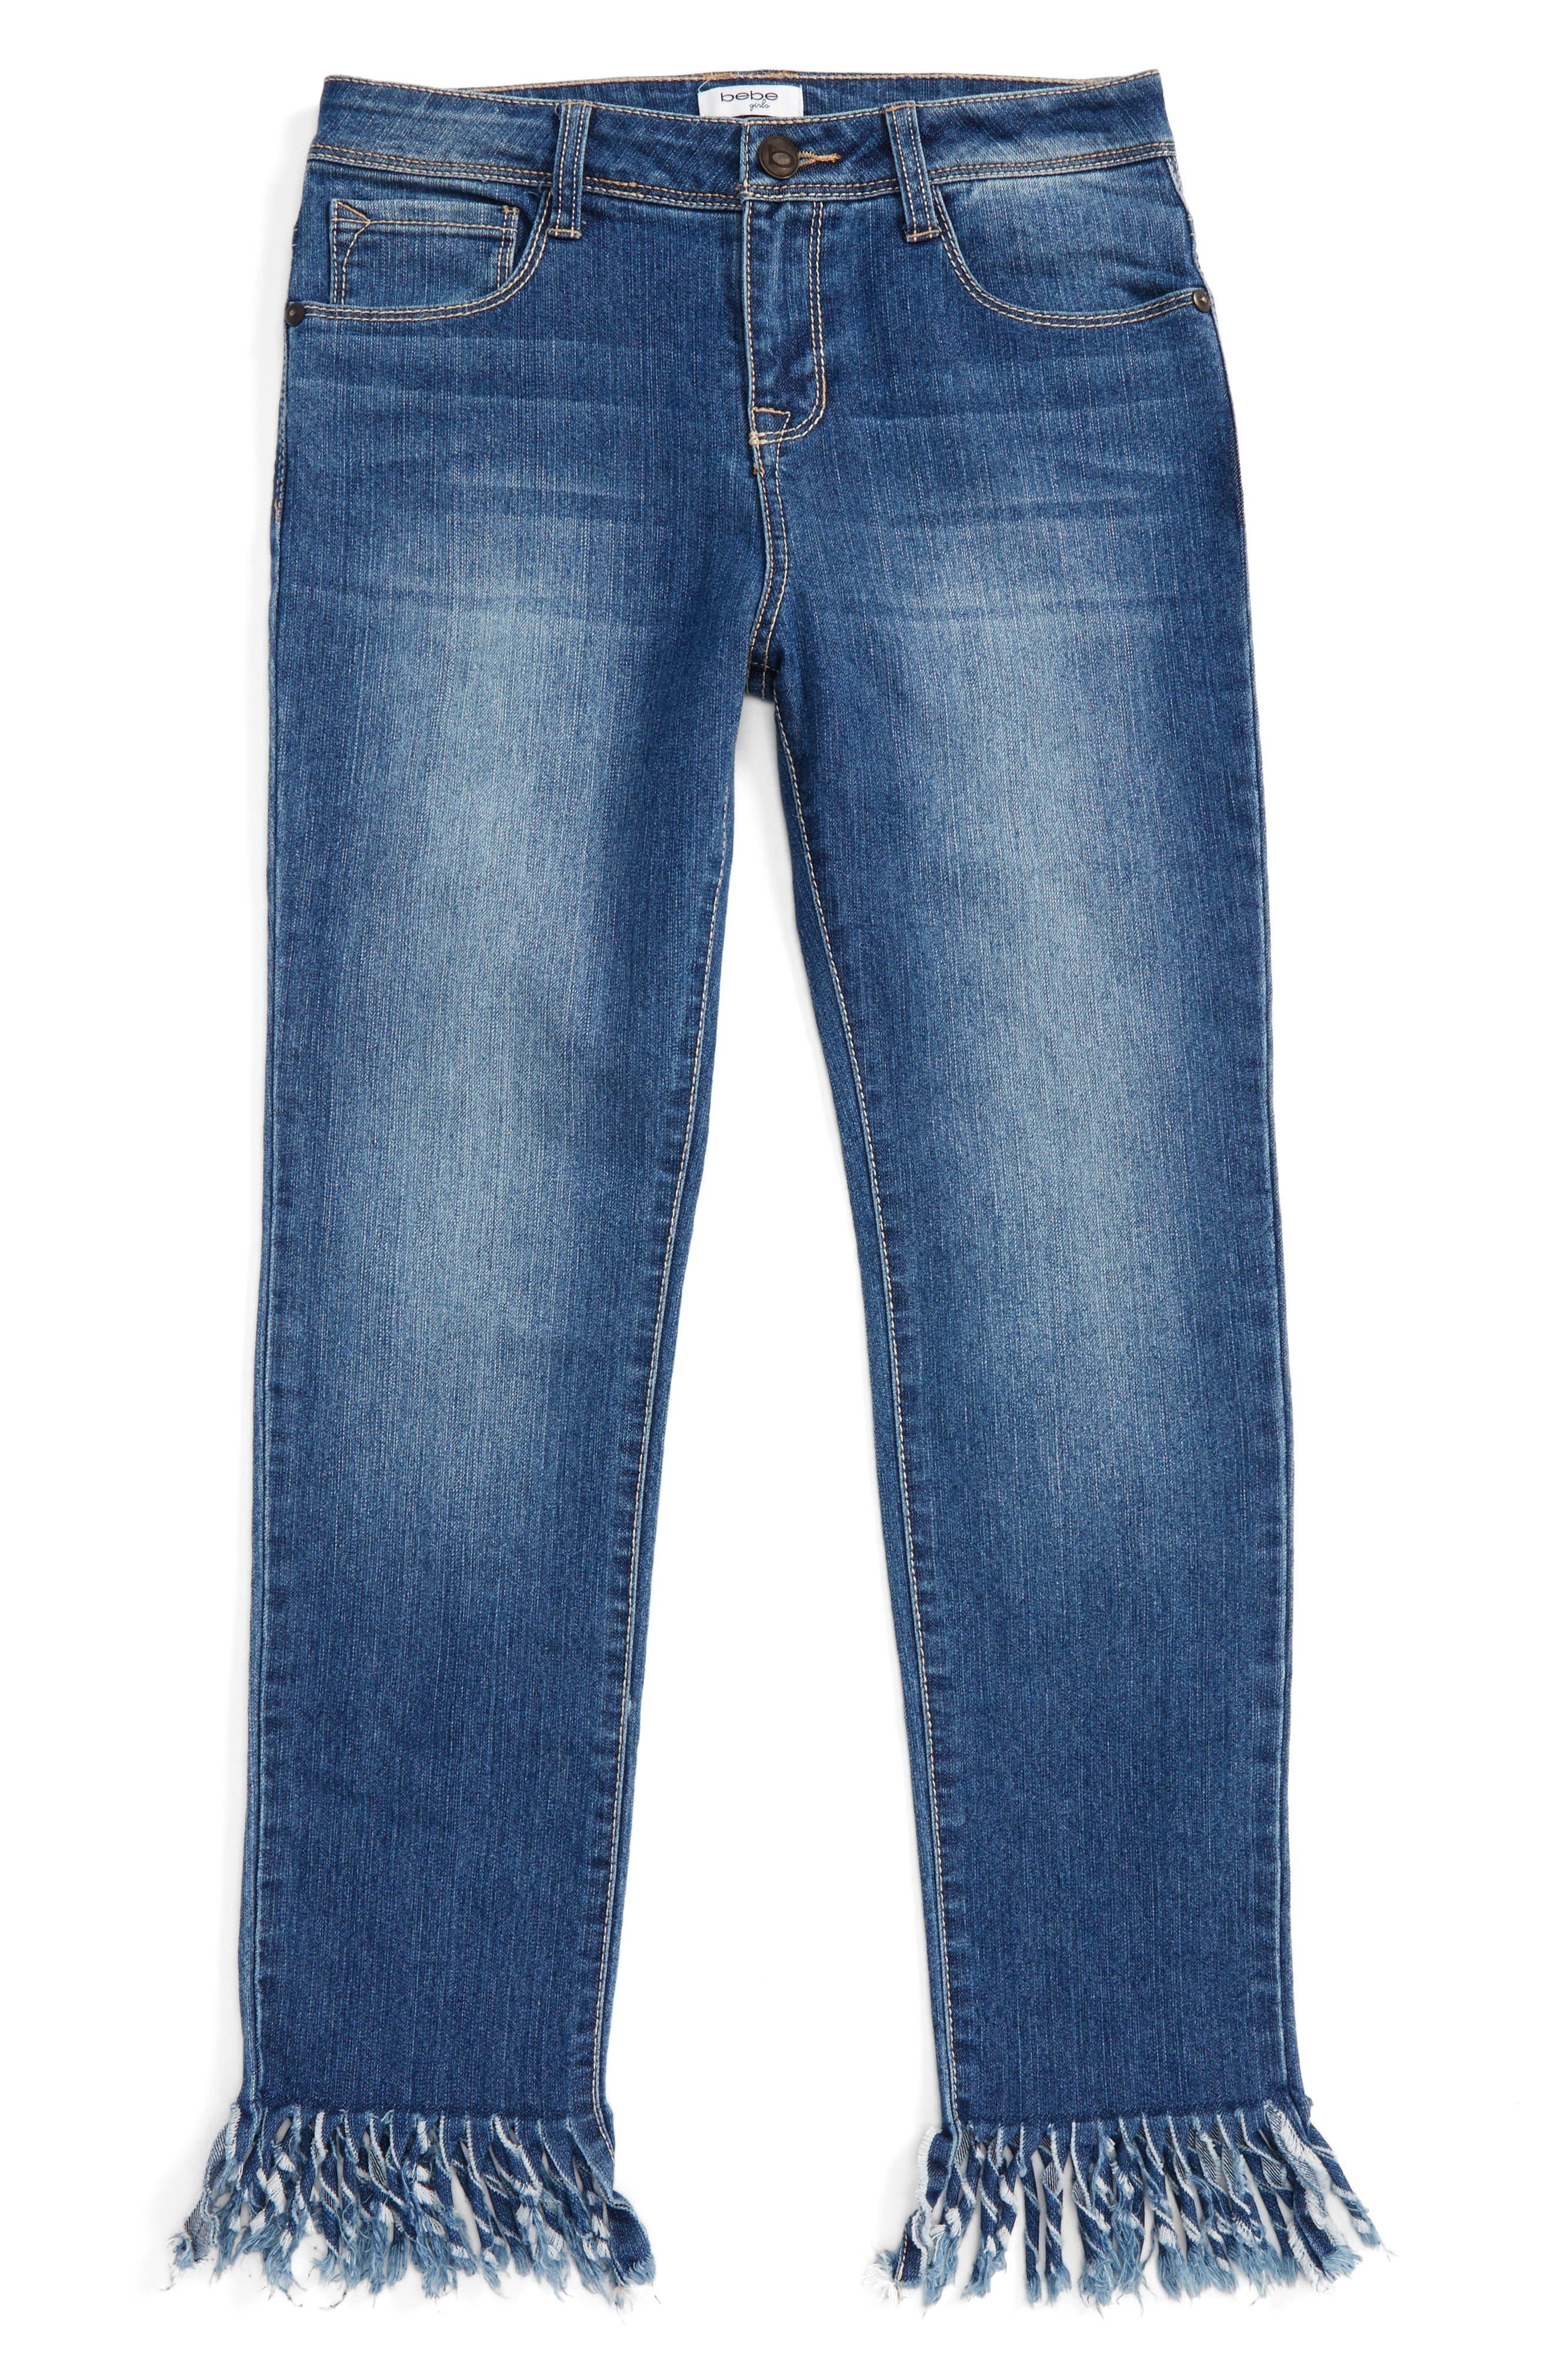 Fringe Jeans,                             Main thumbnail 1, color,